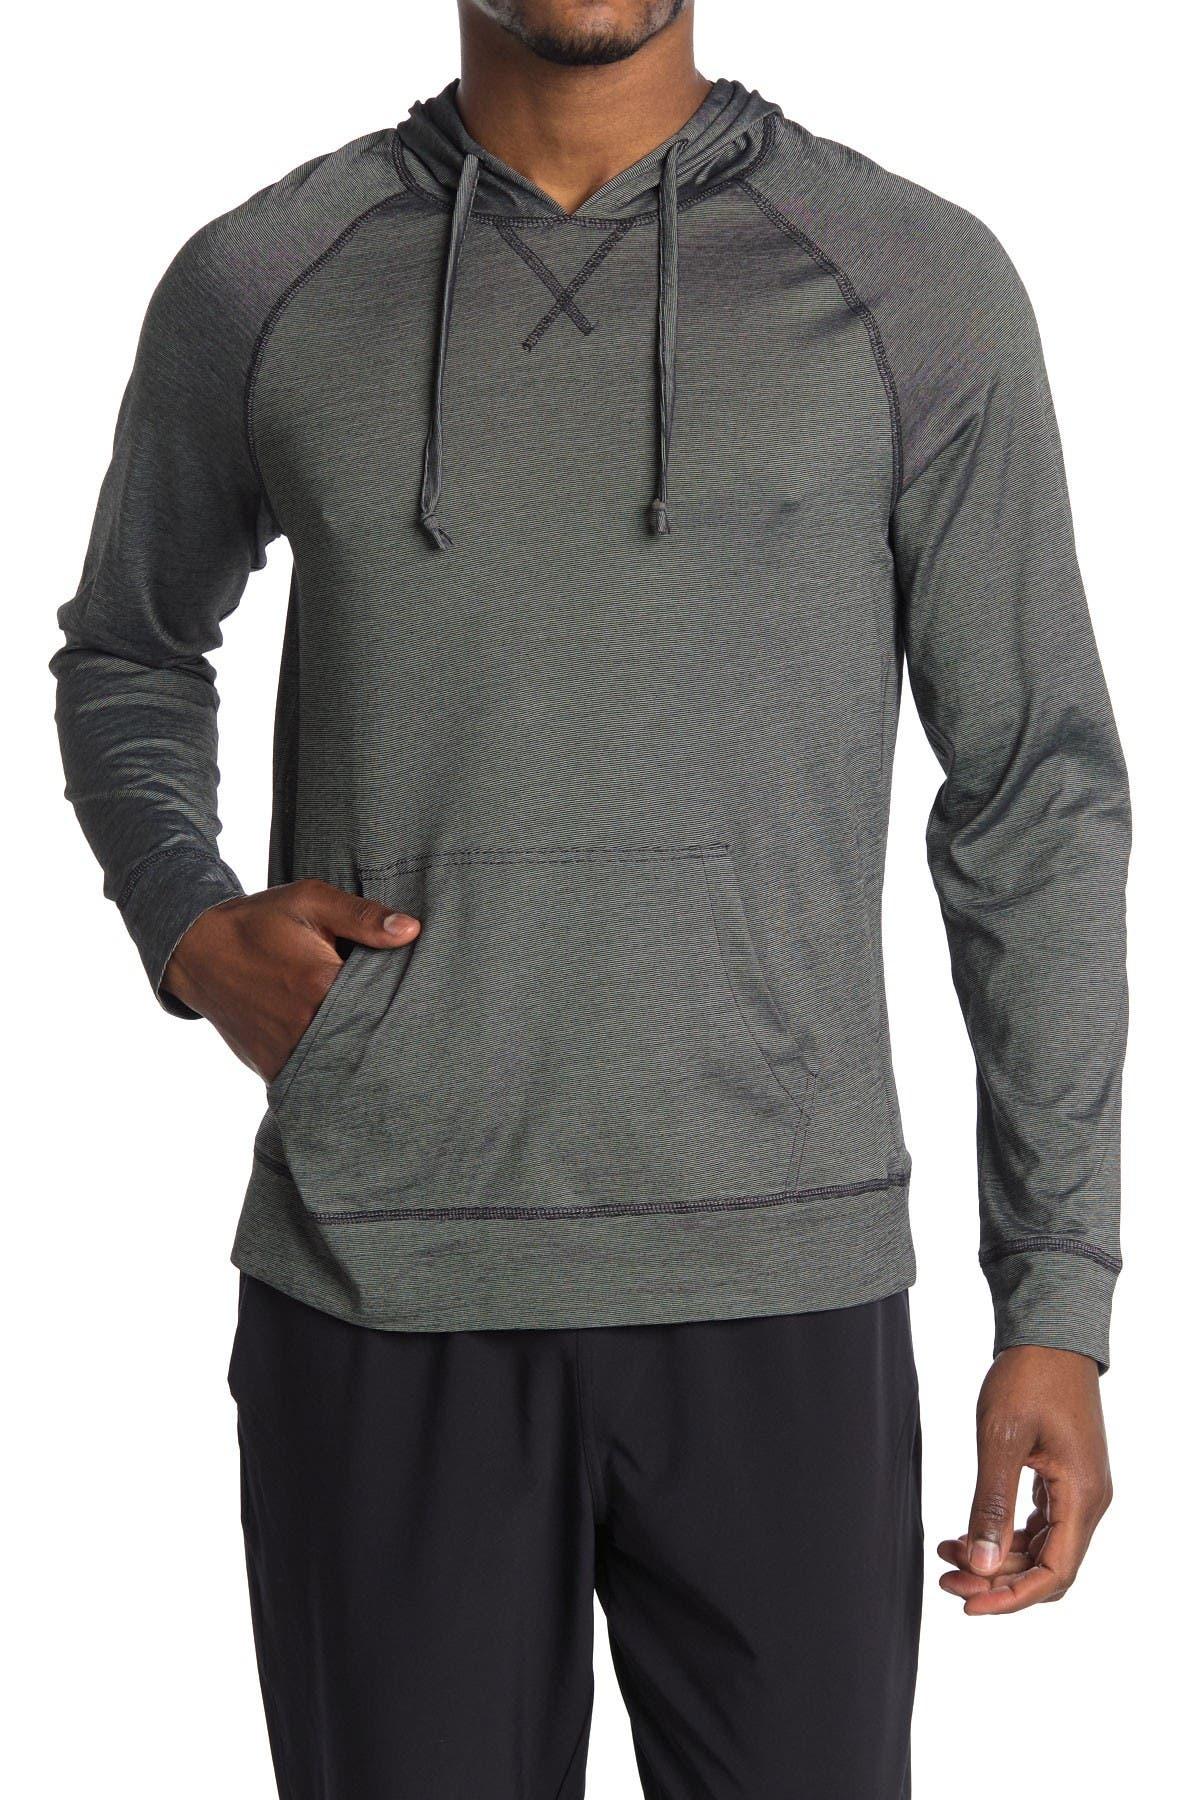 Image of Public Opinion Fineline Hooded Long Sleeve Shirt